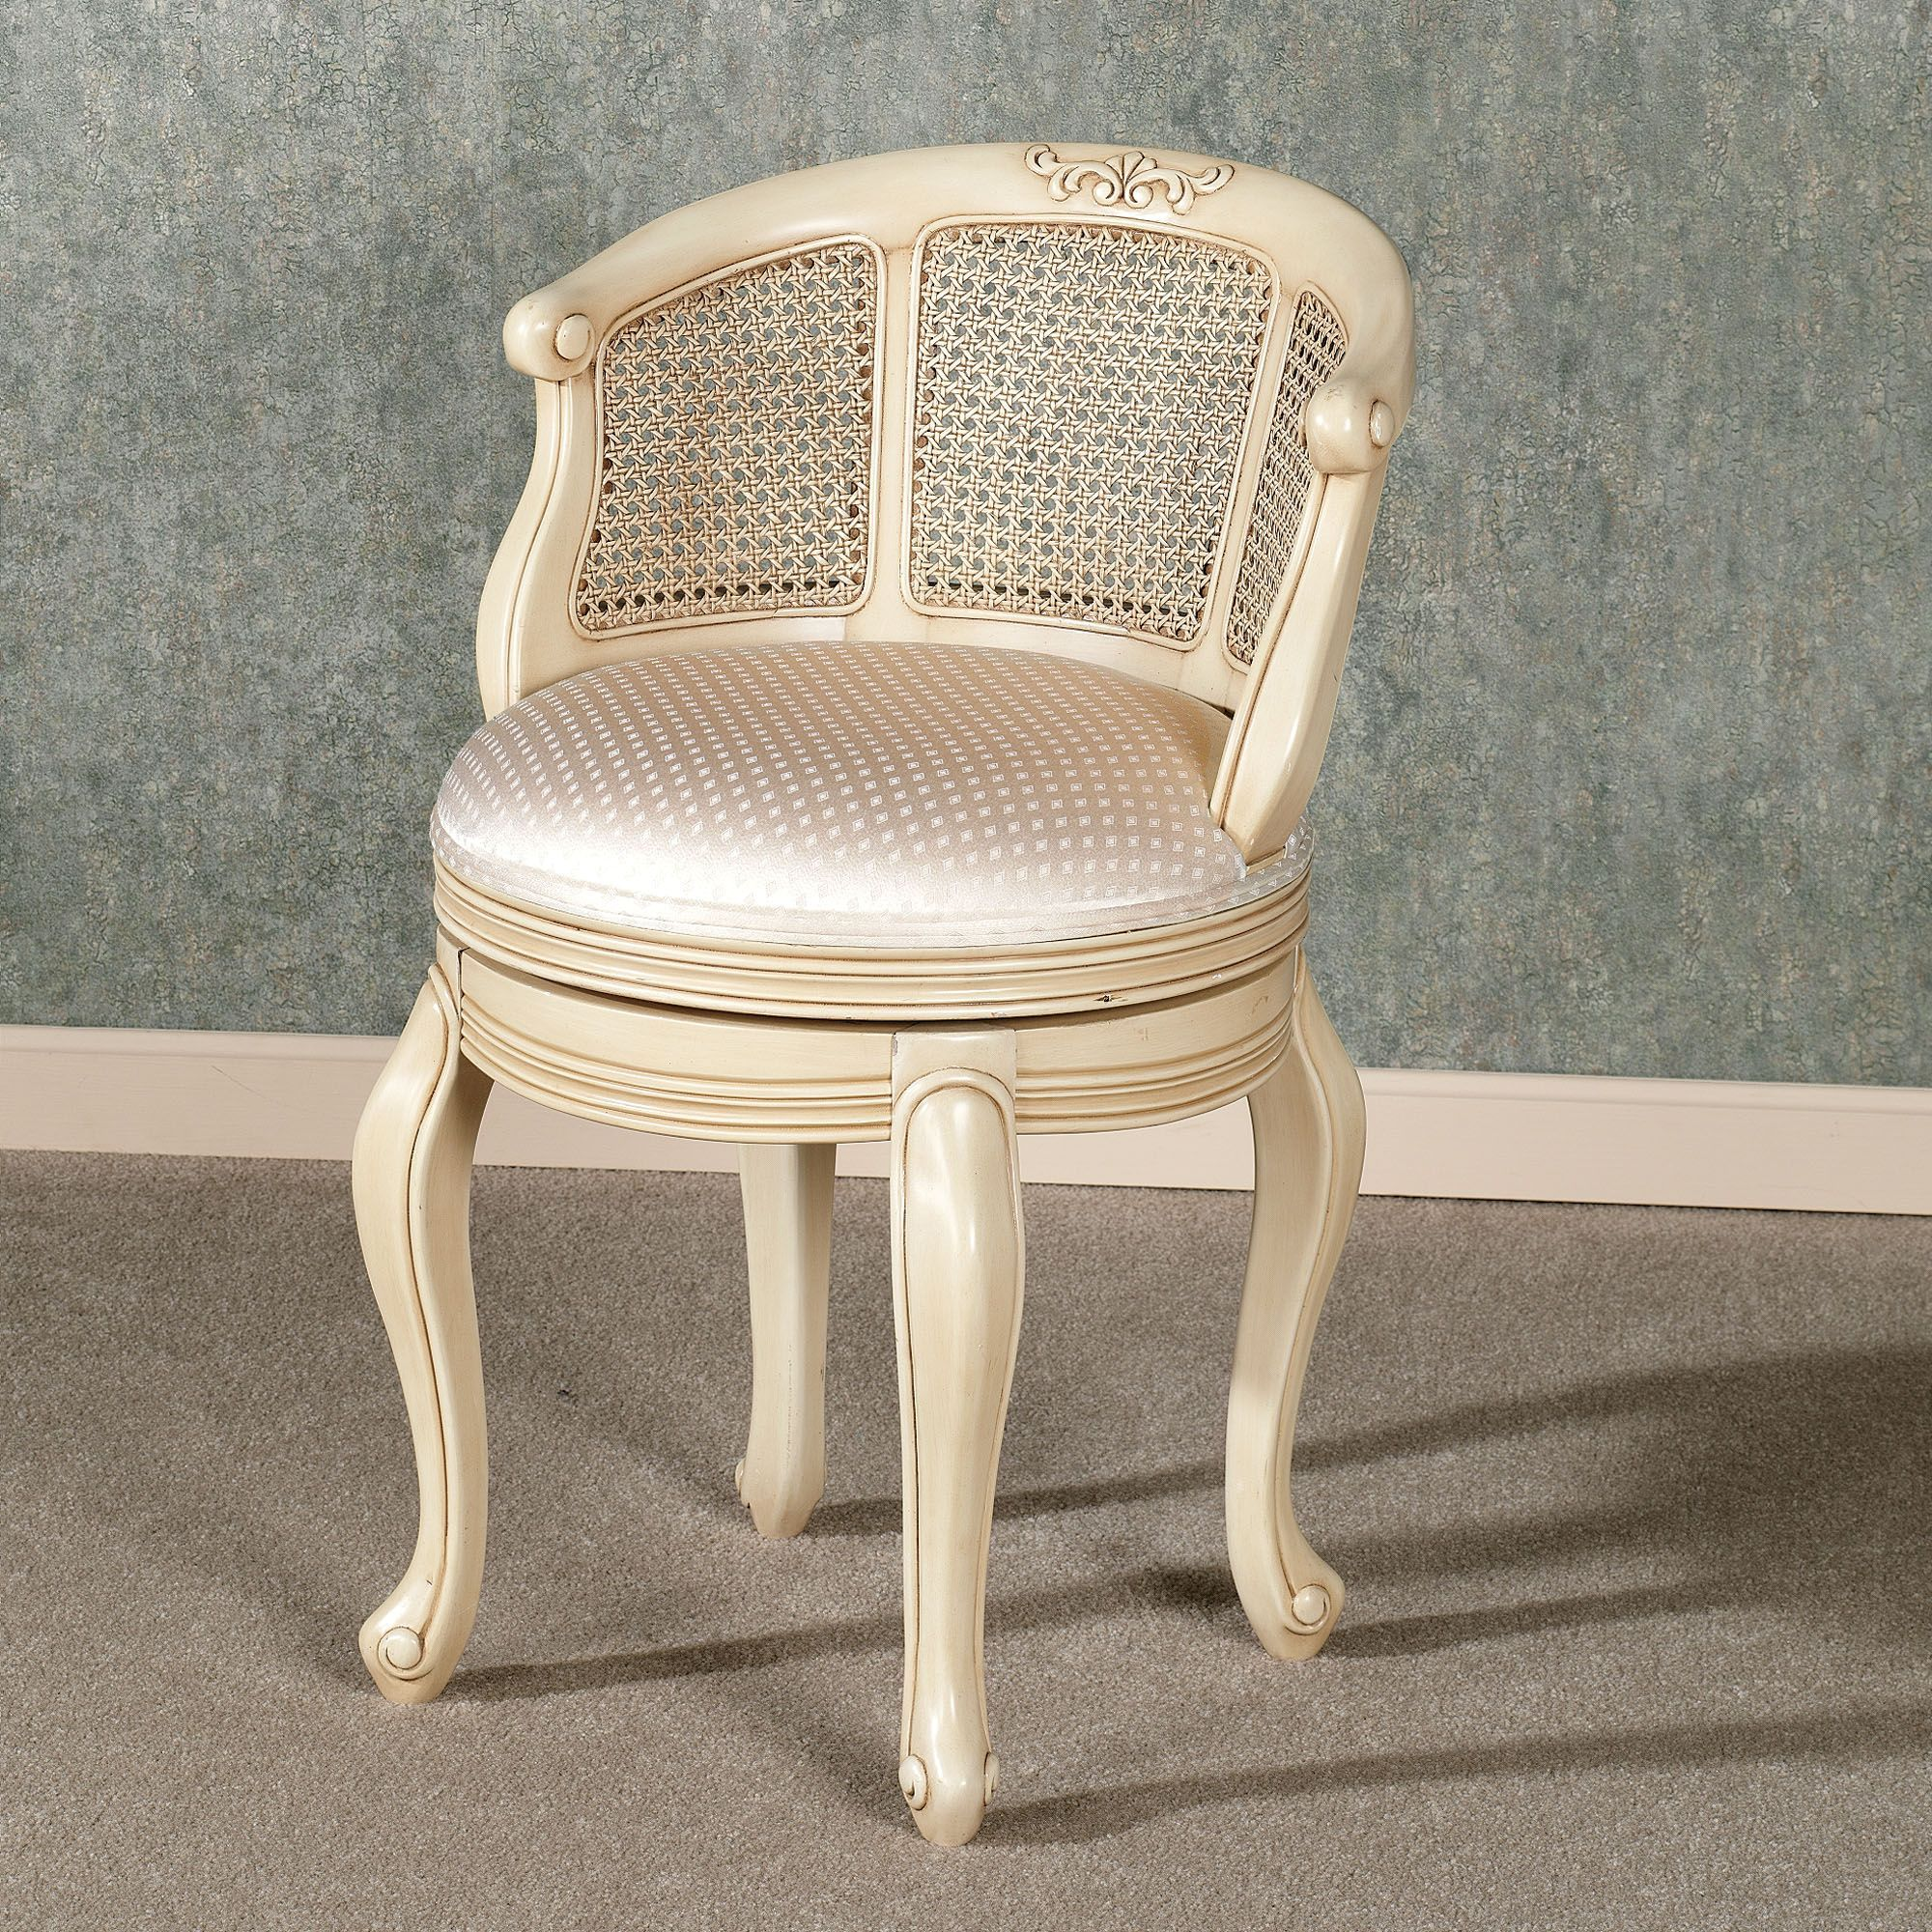 Belhurst swivel vanity chair with images shabby chic